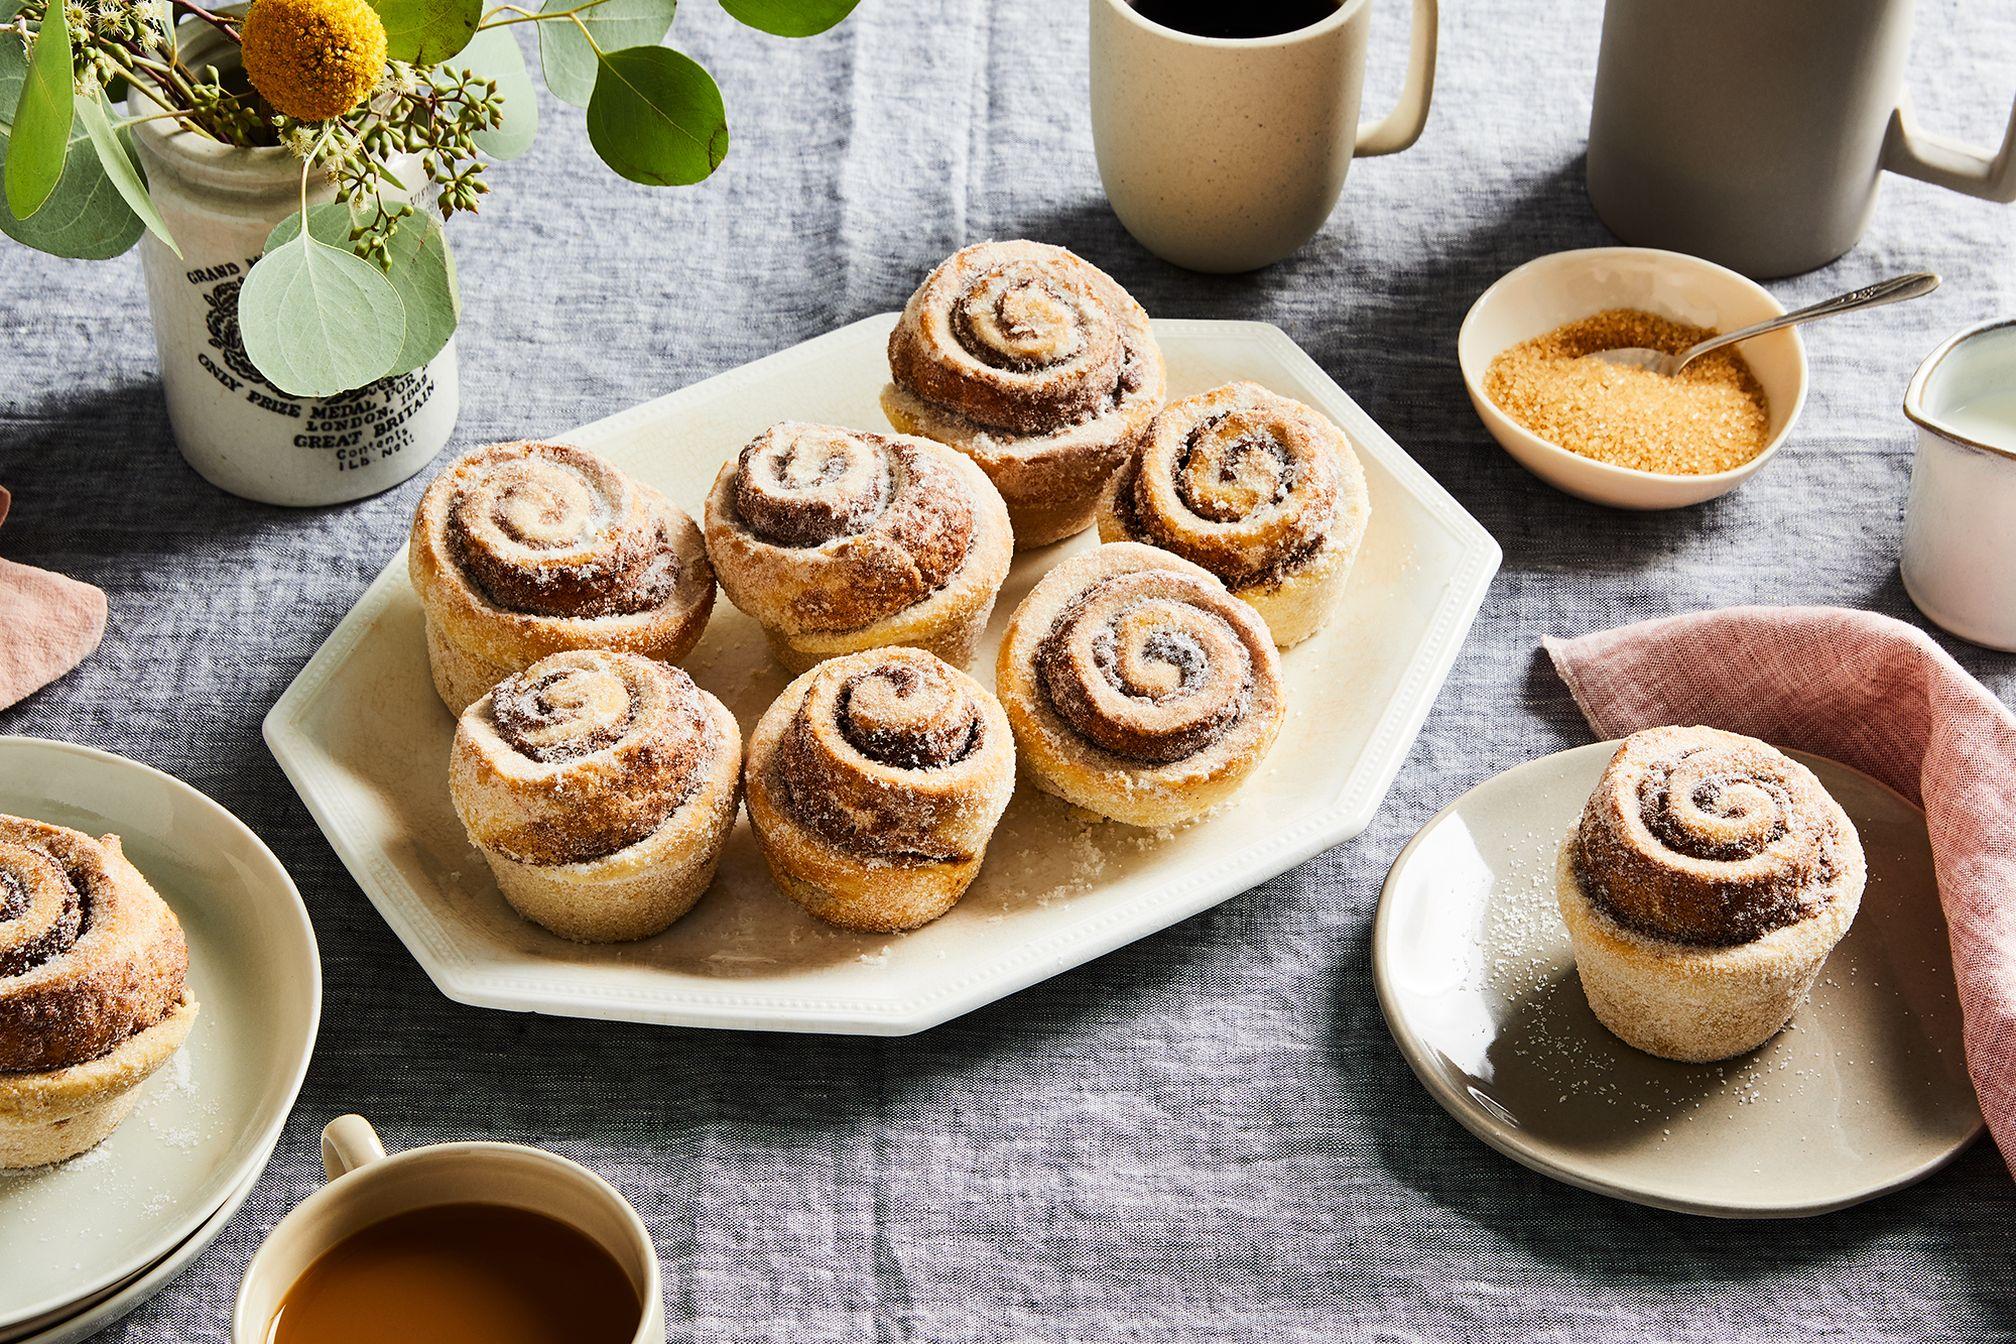 Violet Bakery S Cinnamon Buns Recipe On Food52